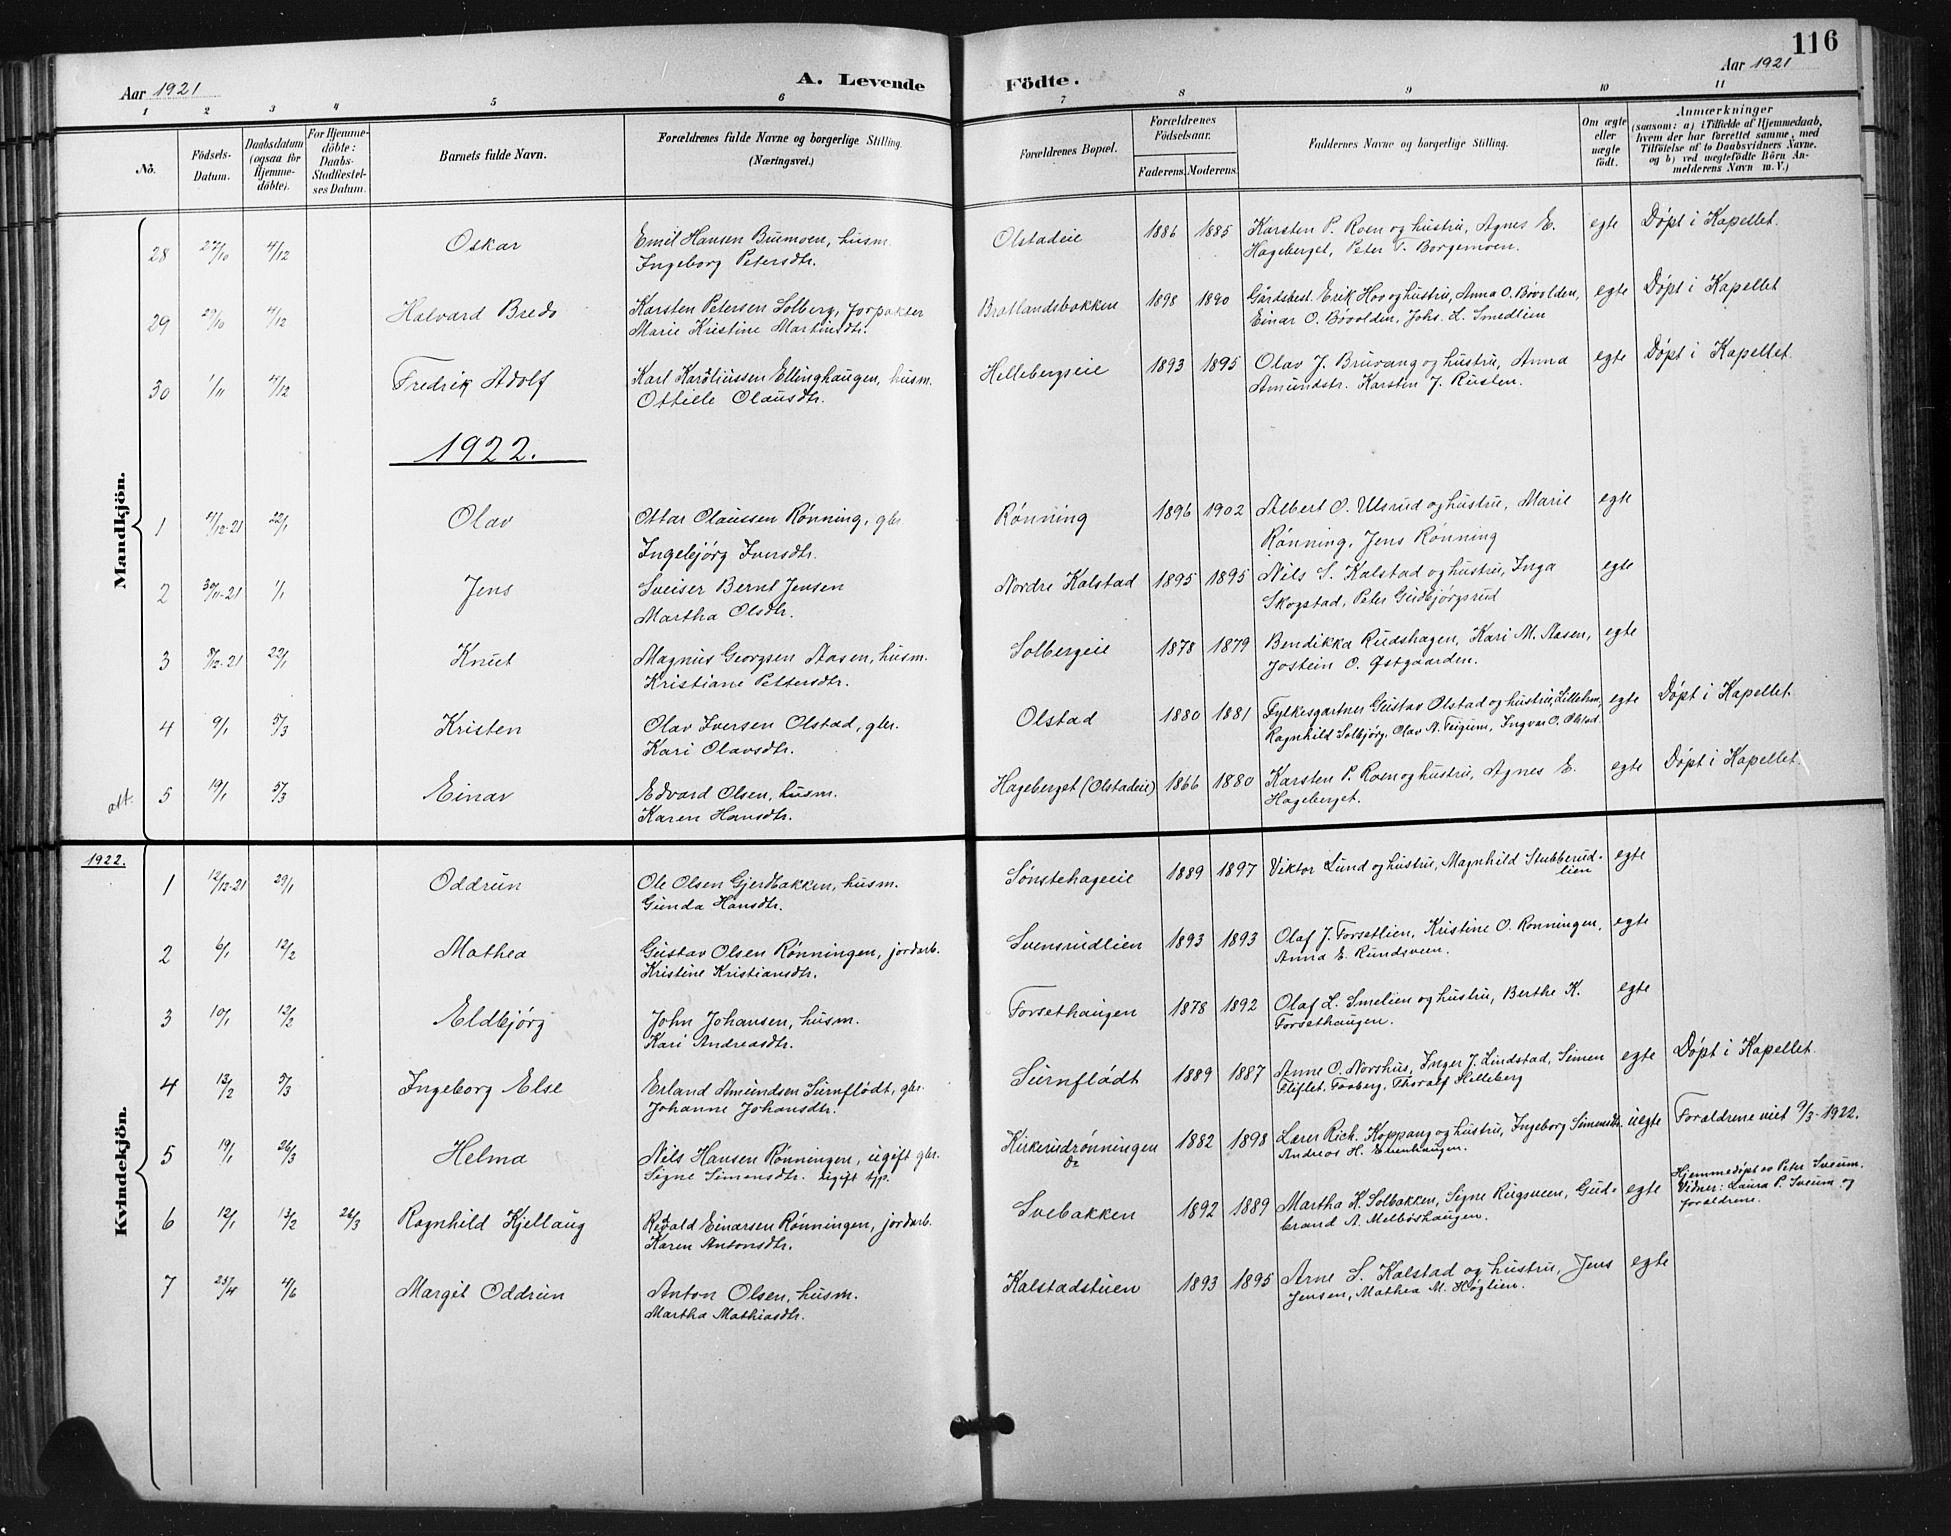 SAH, Vestre Gausdal prestekontor, Klokkerbok nr. 3, 1896-1925, s. 116